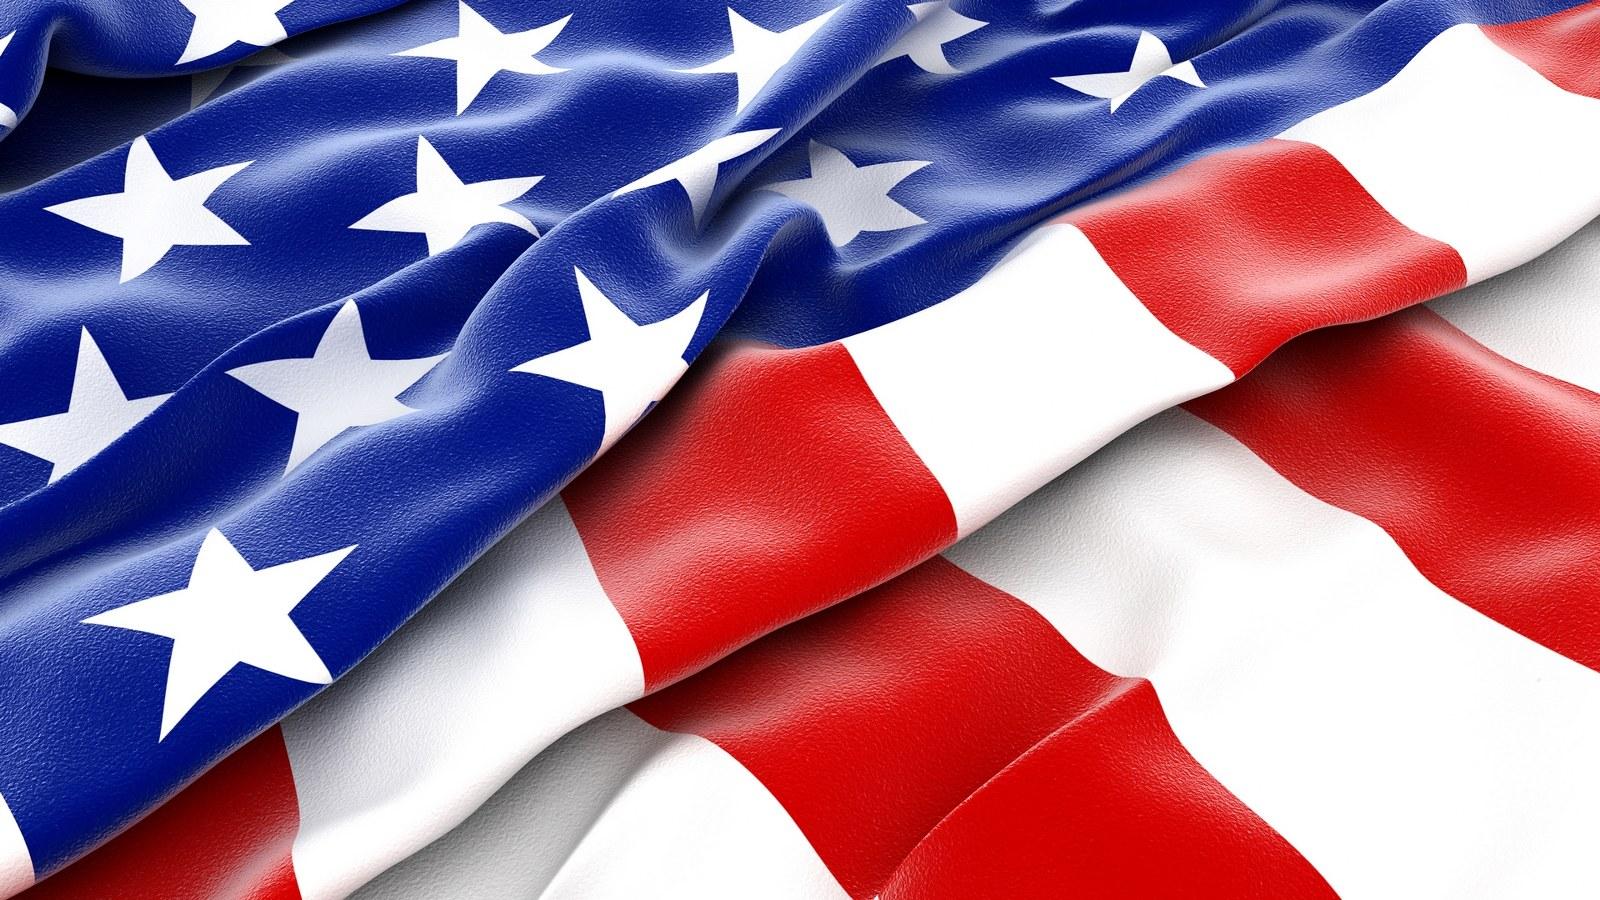 High Resolution American Flag Wallpaper